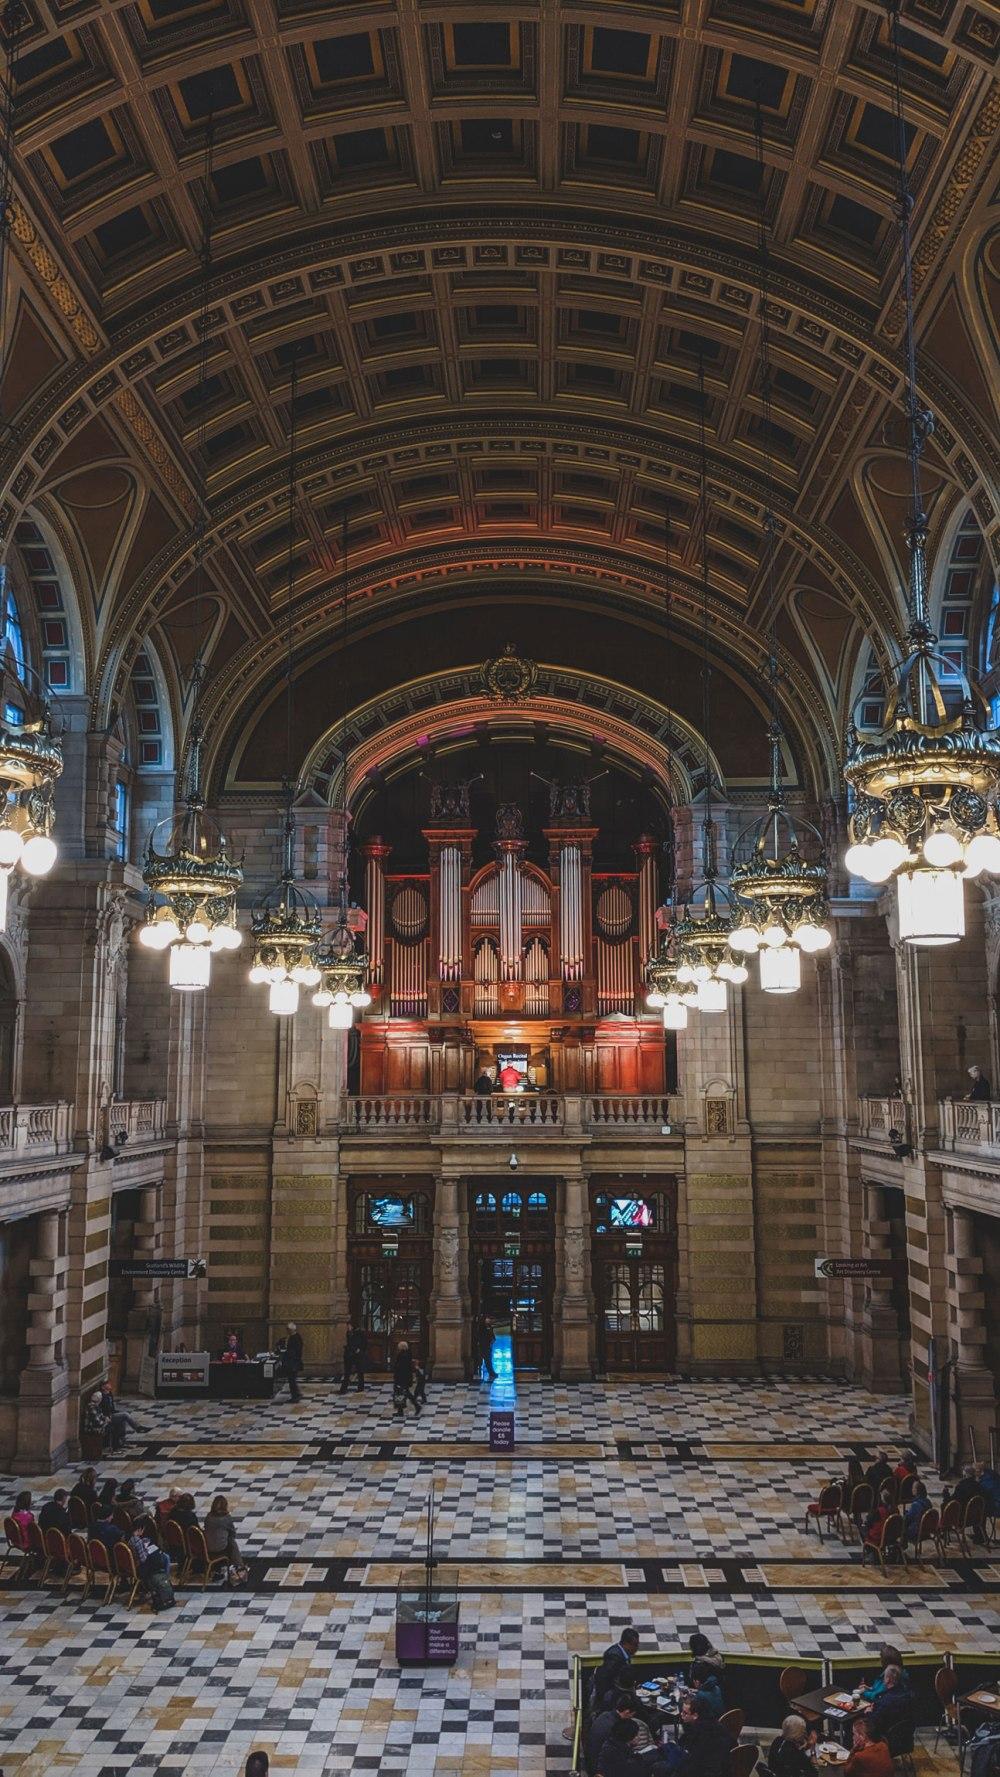 Kelvingrove-Art-Gallery-and-Museum-Glasgow (11)